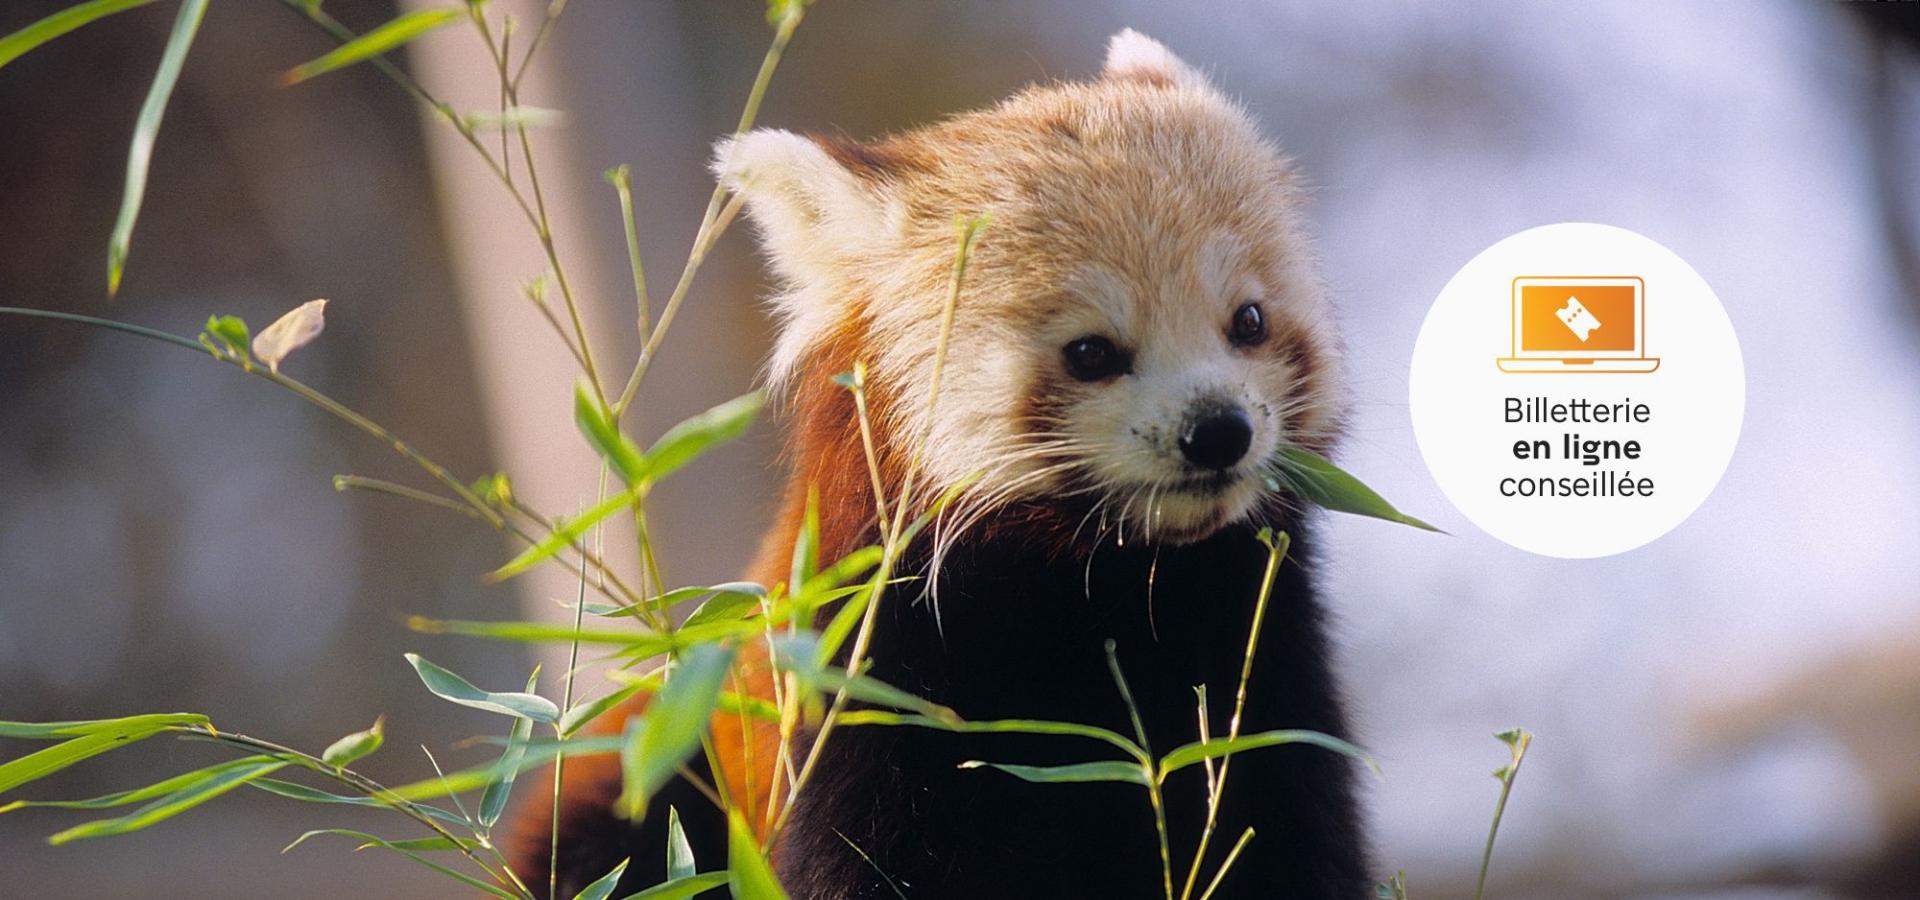 Panda roux © MNHN - F.-G. Grandin